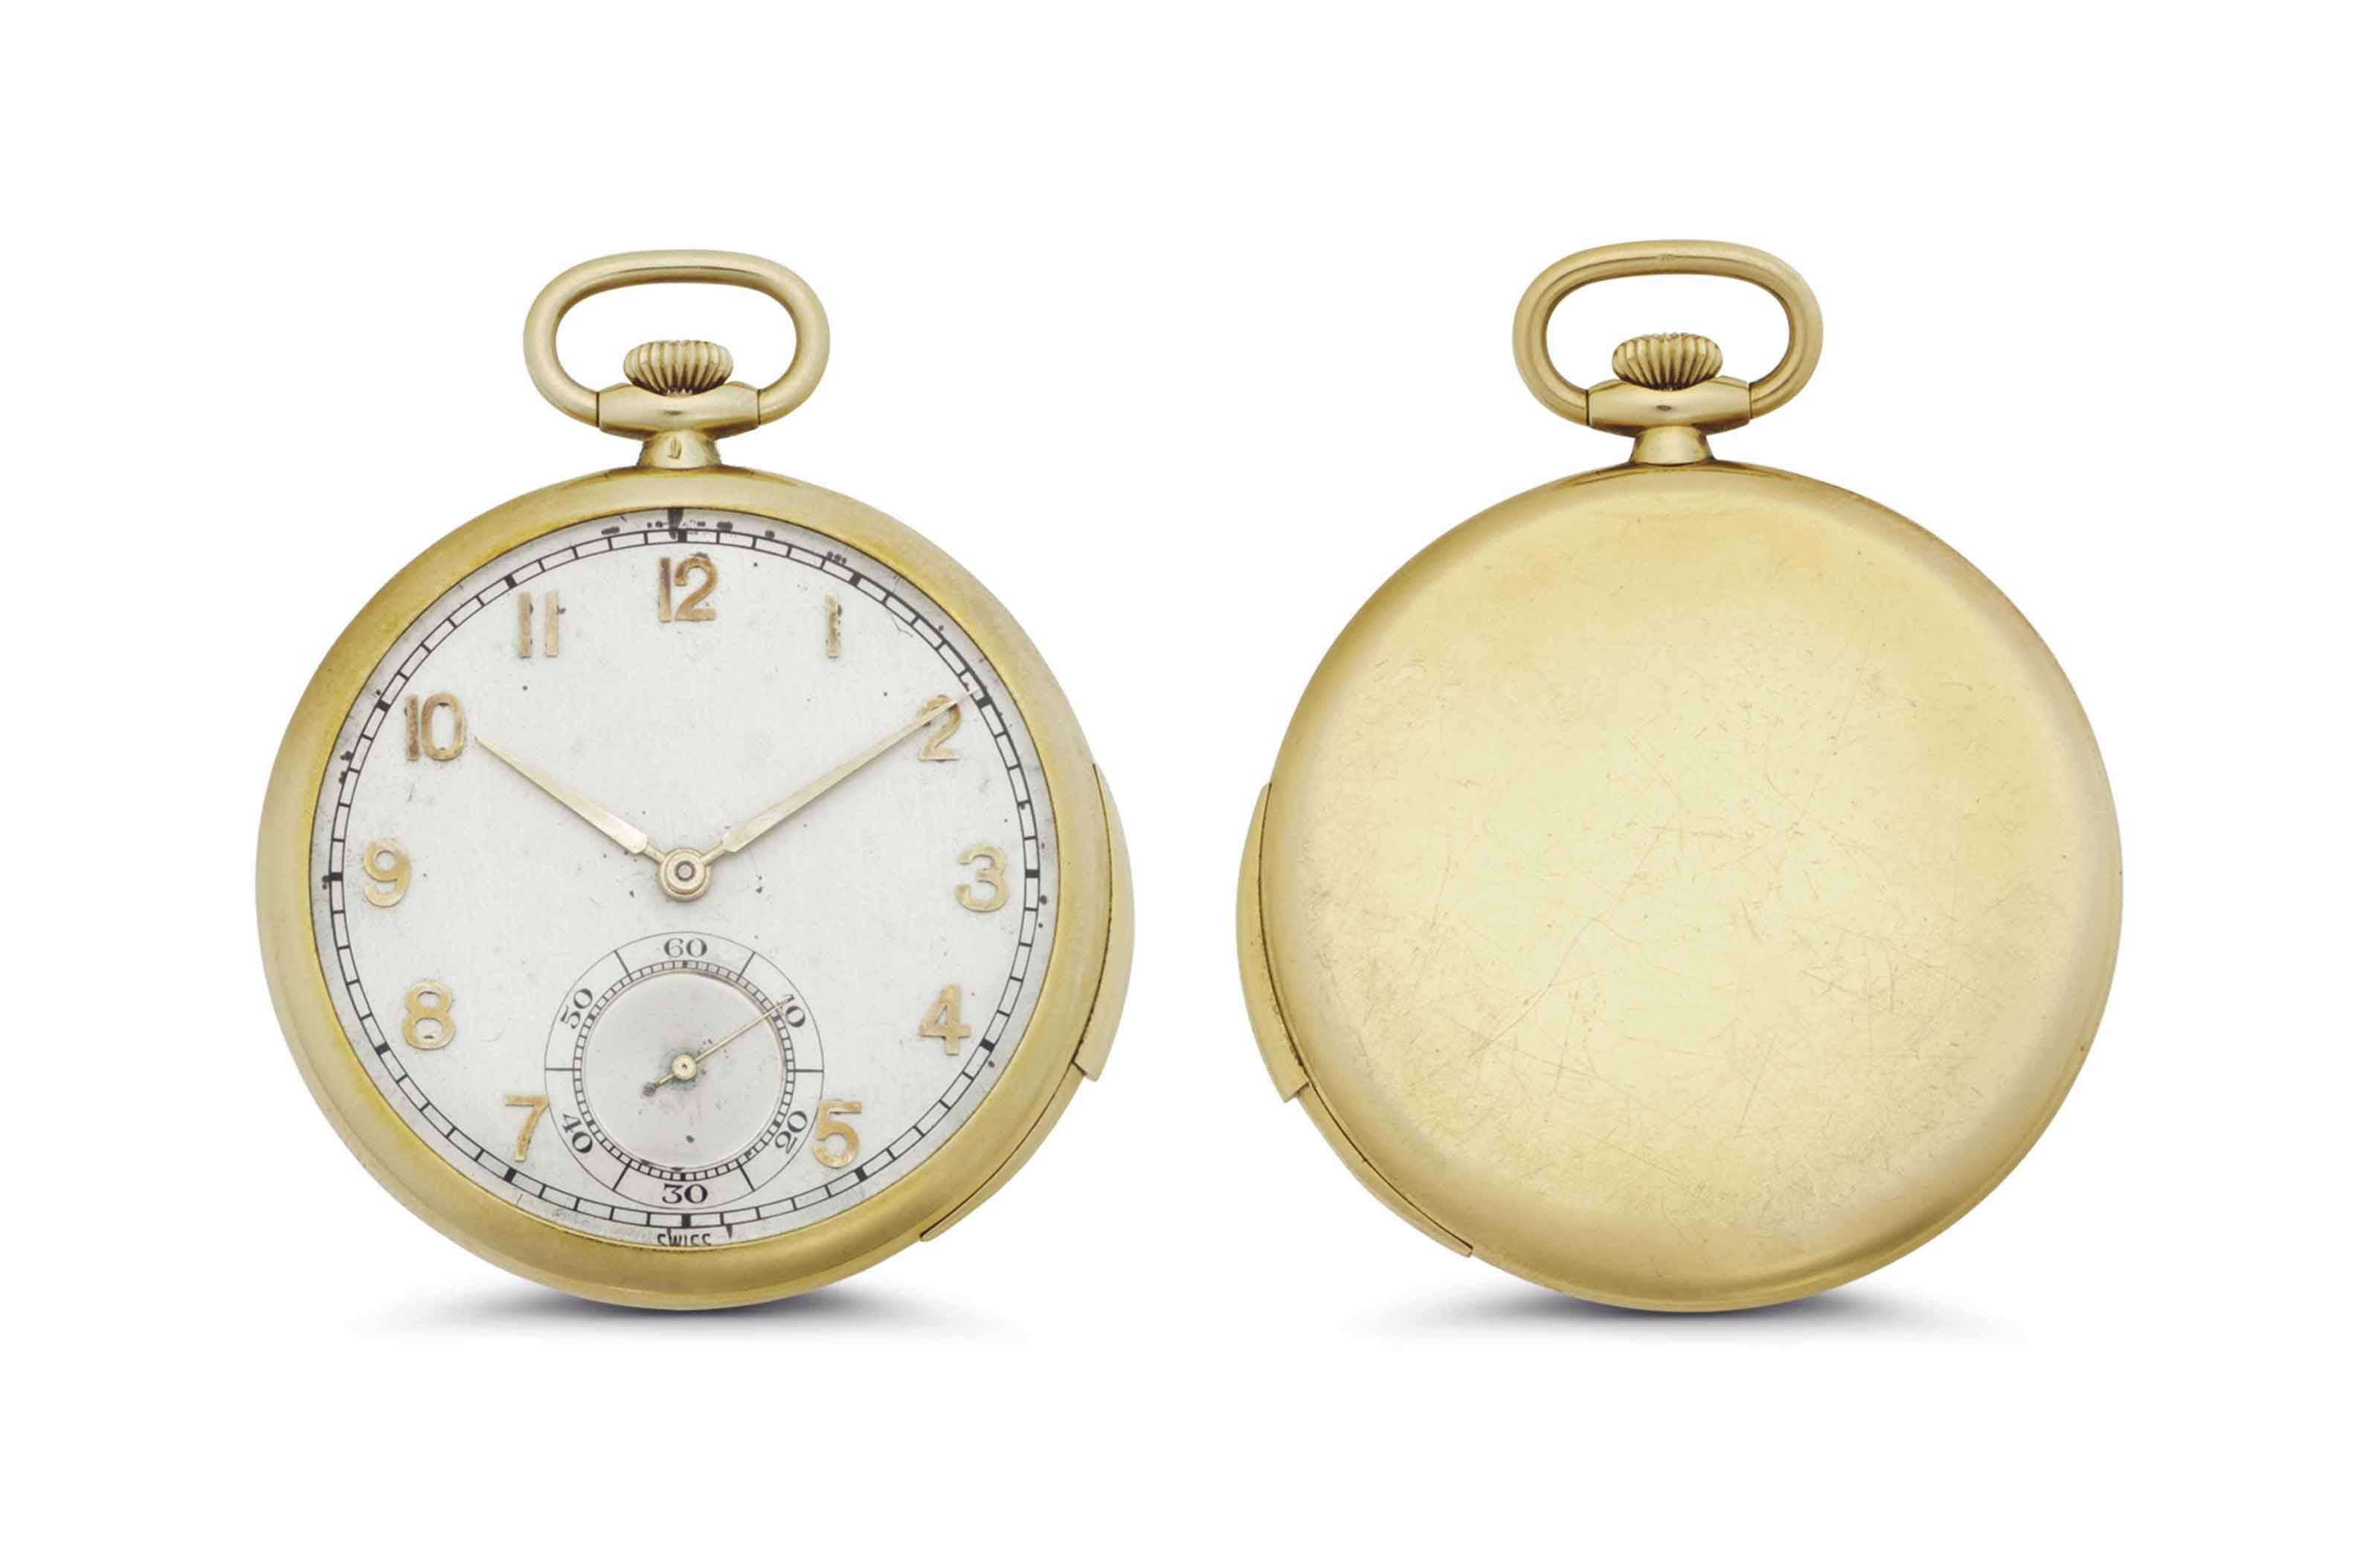 C. H. Meylan. A Fine 18k Gold Ultrathin Minute Repeating Openface Keyless Lever Dress Watch